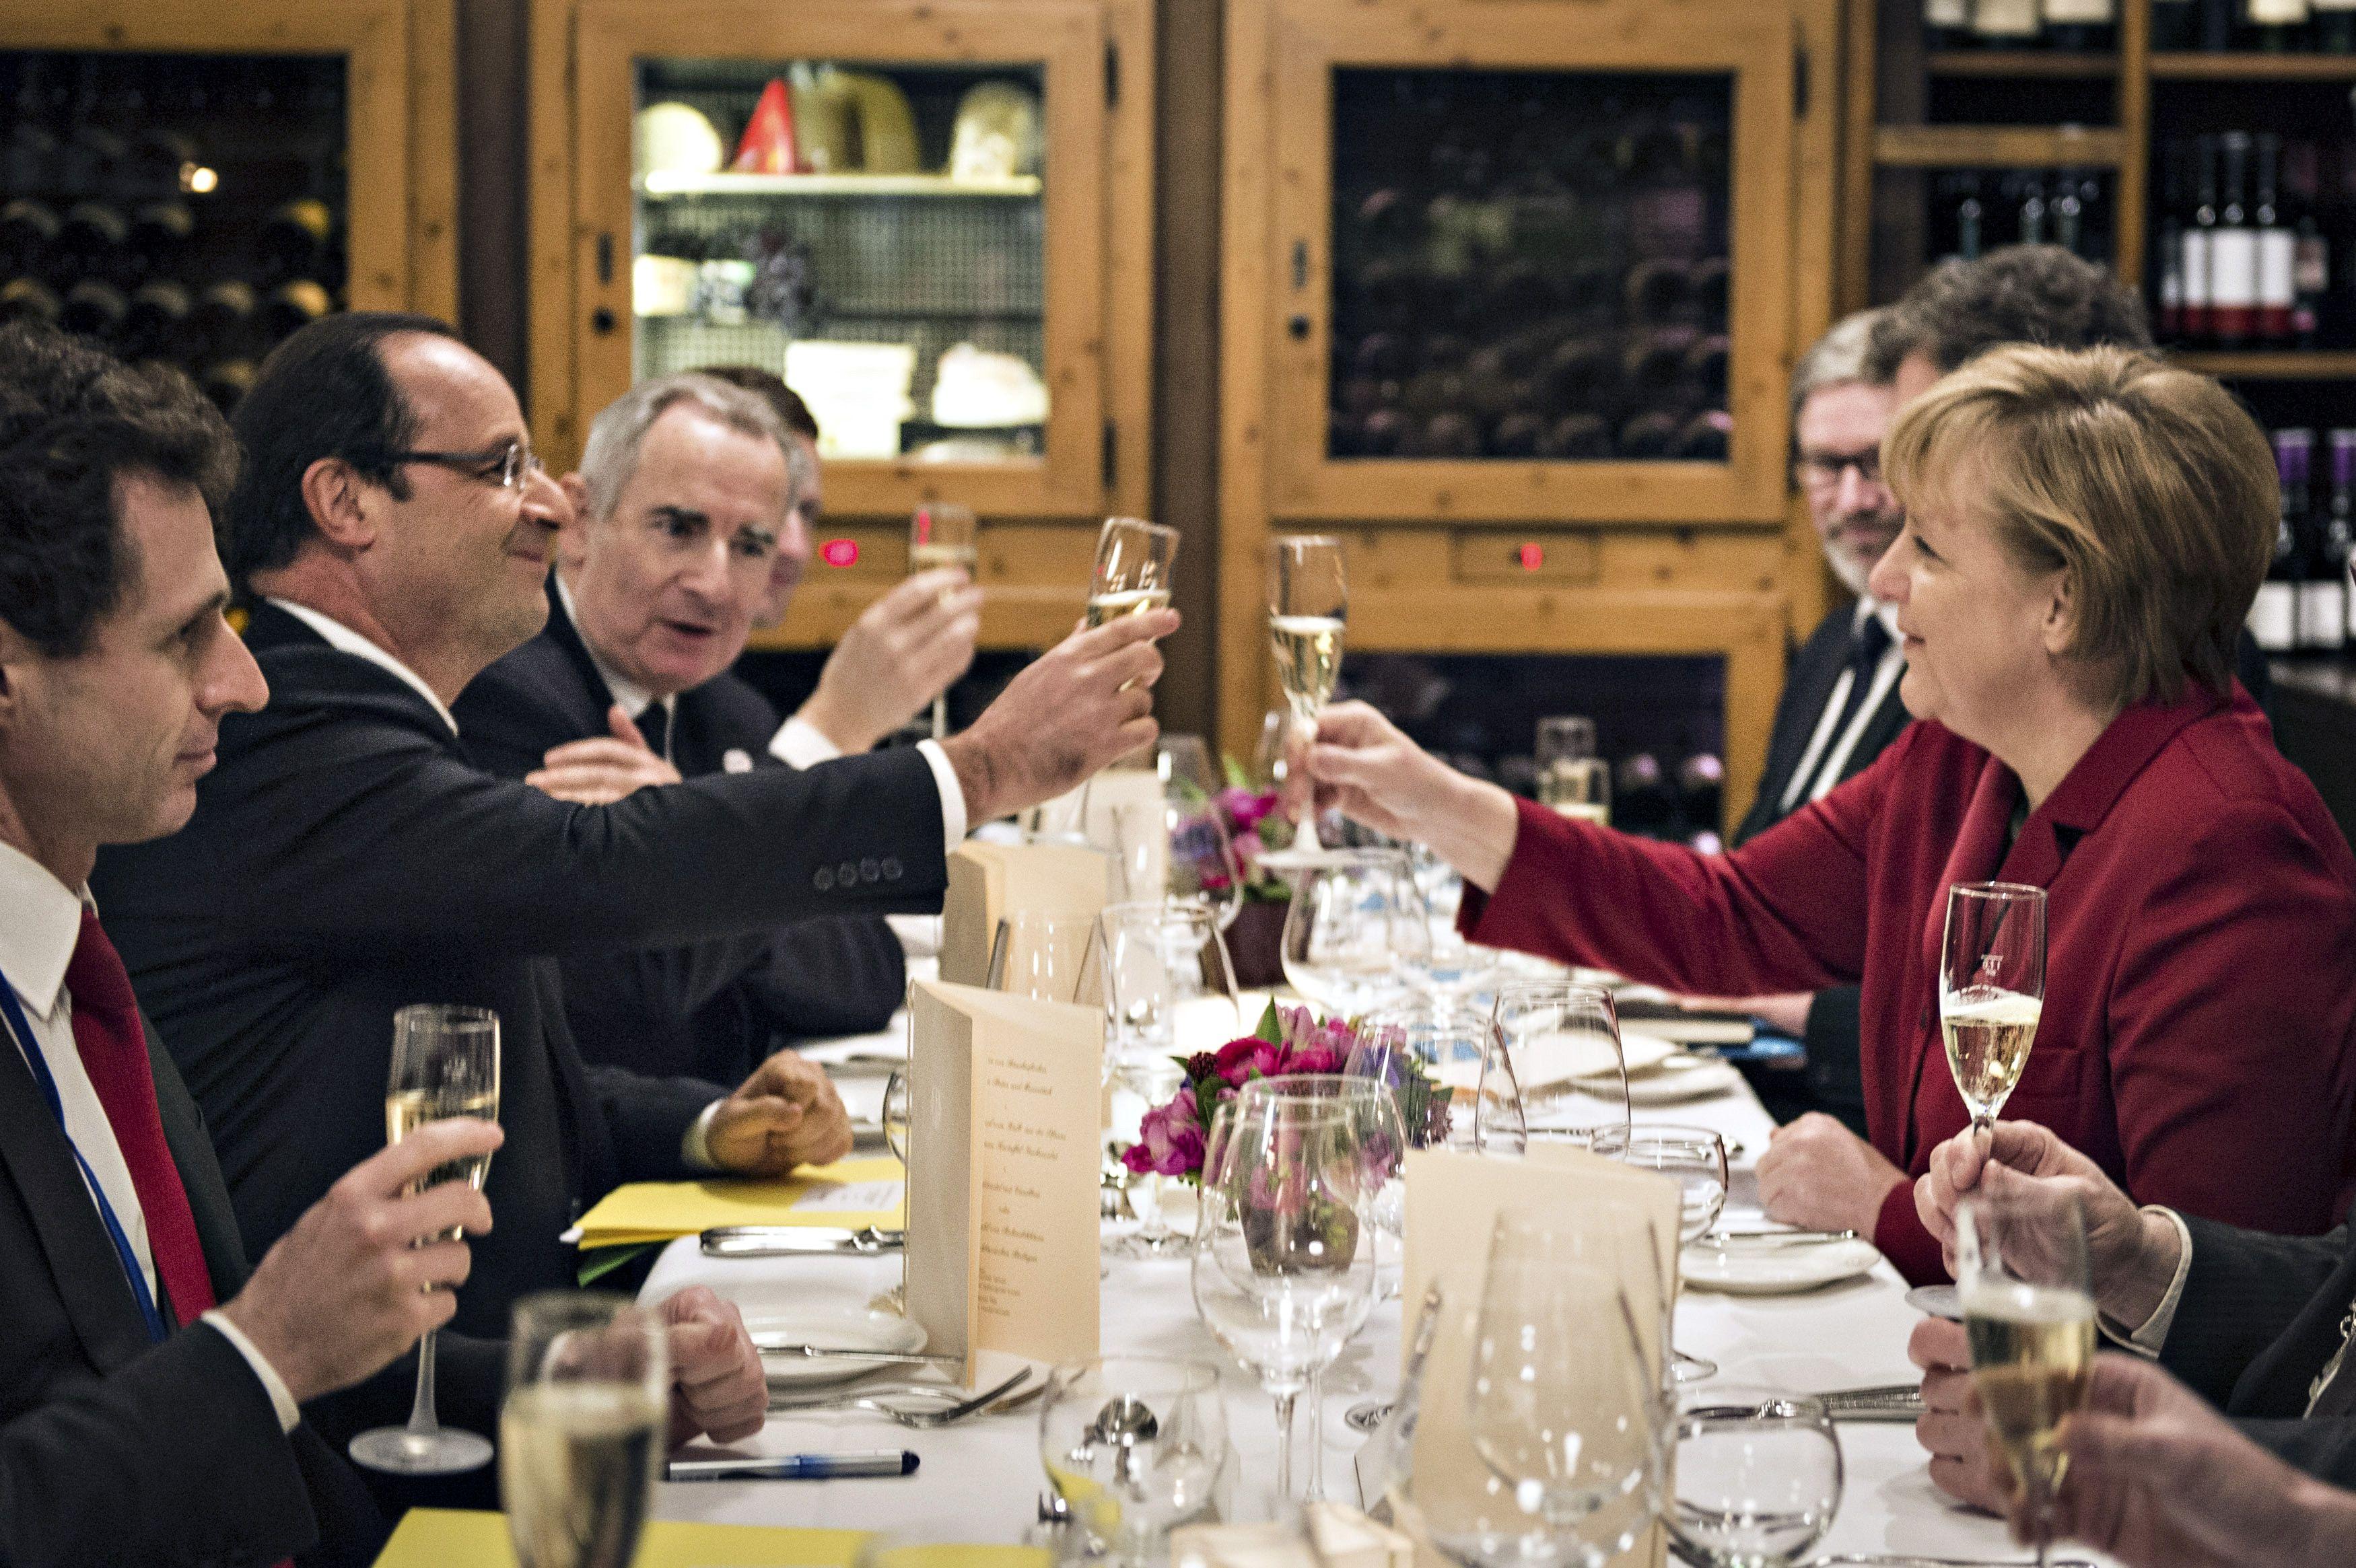 Berlyno gastronomijos padang�je � daugyb� �vaig�d�i�